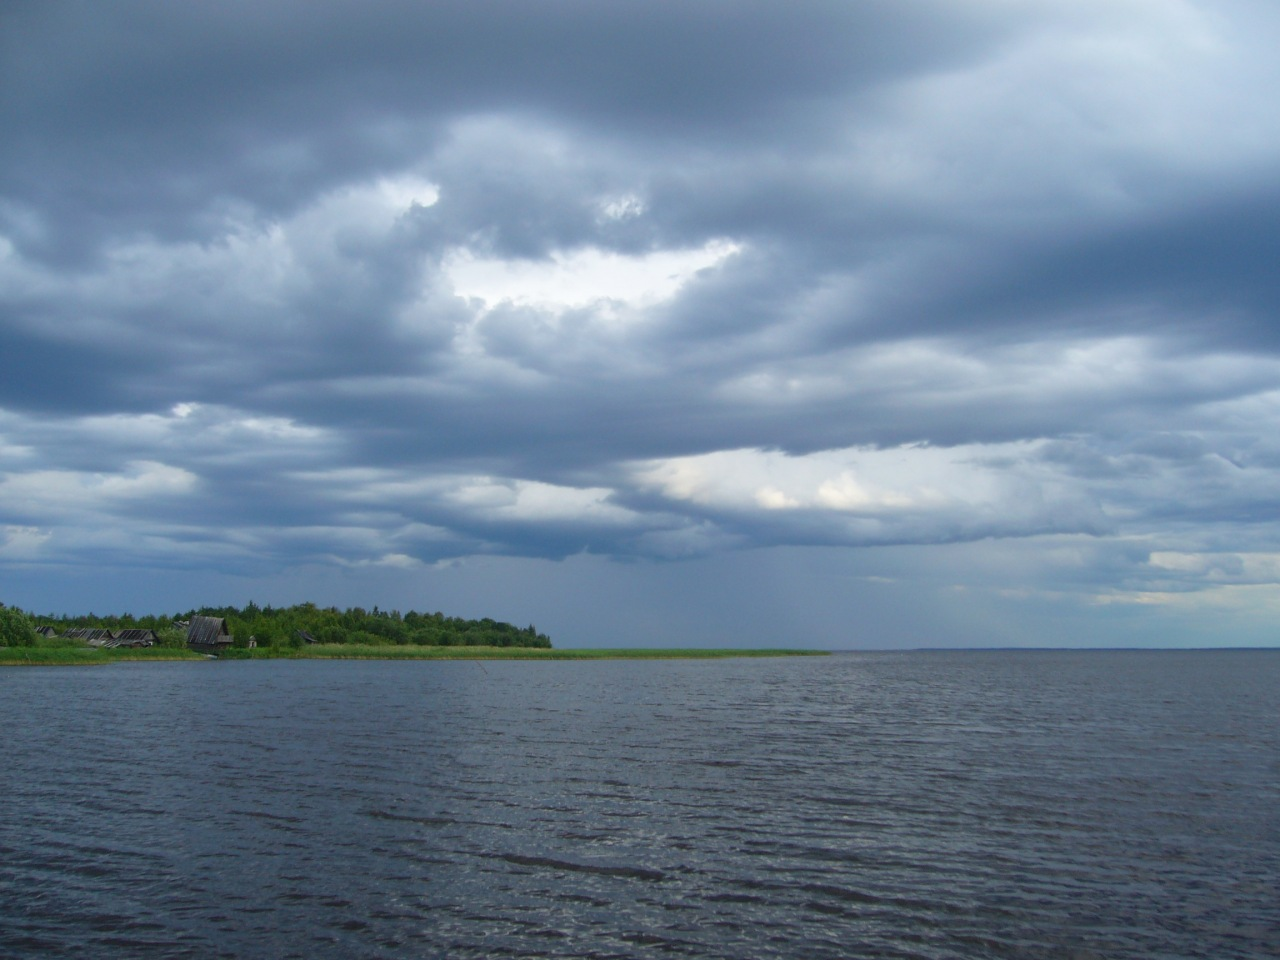 вологодские рыбаки озеро воже